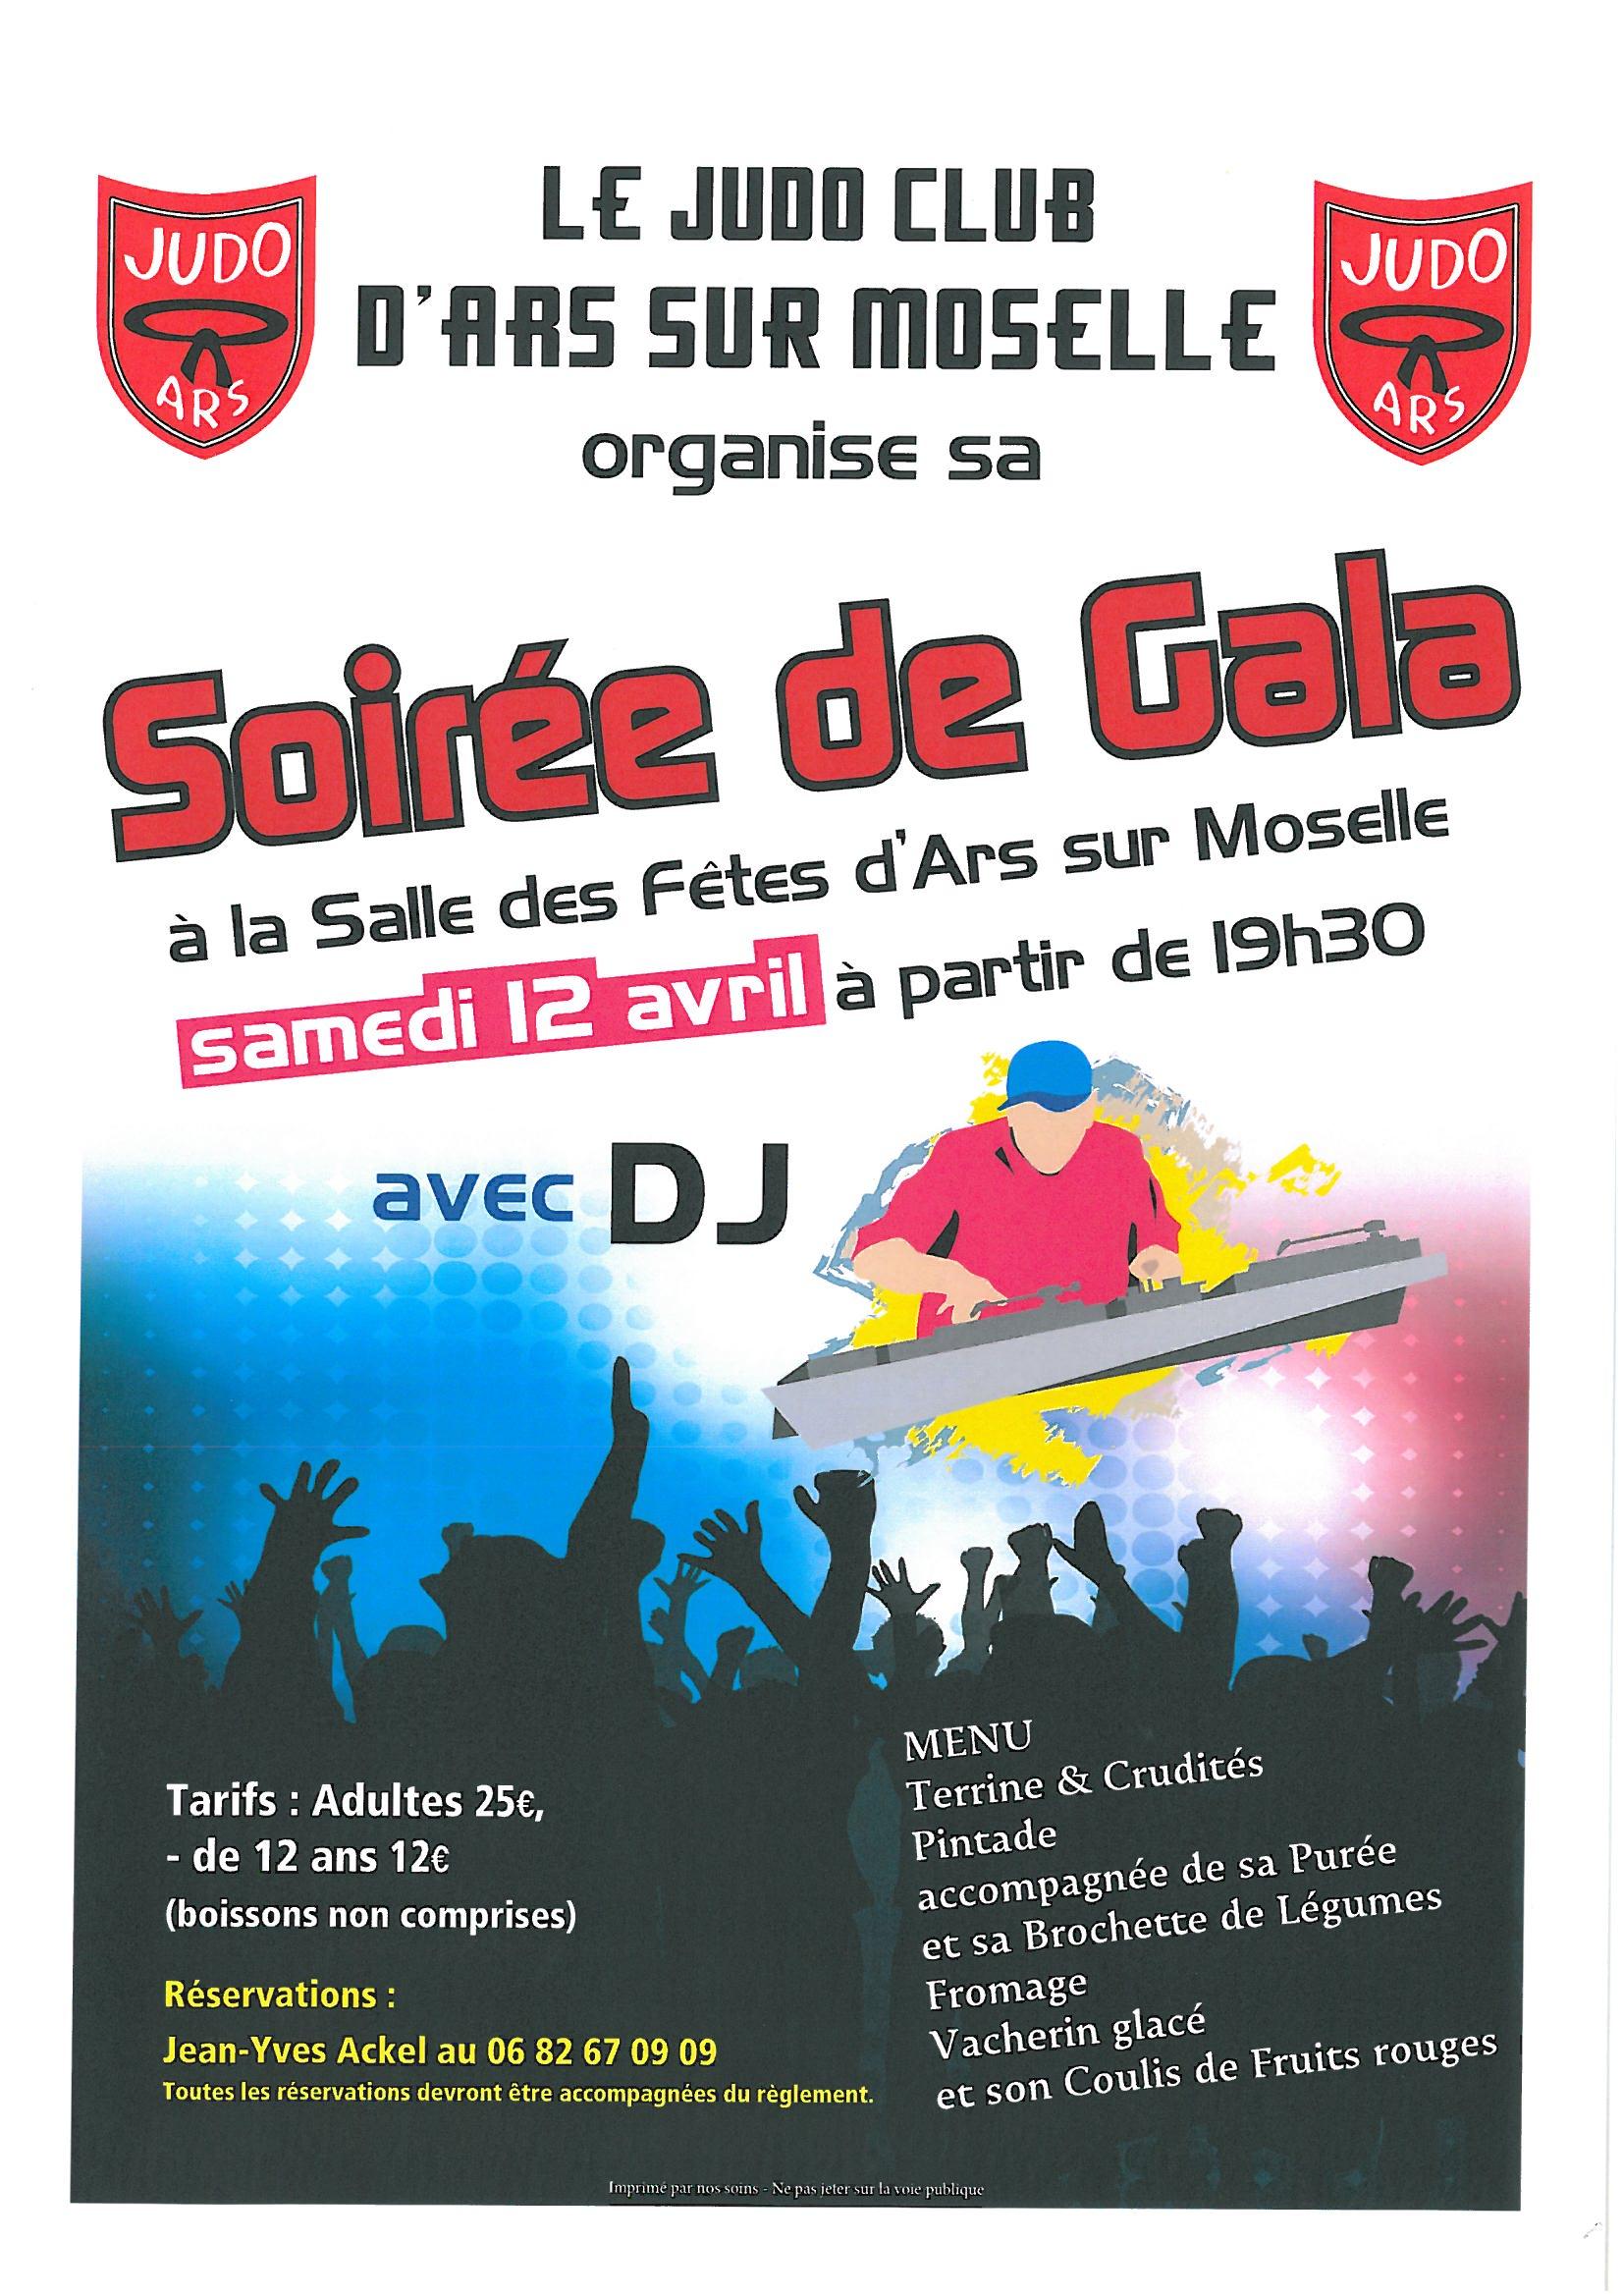 SOIREE DE GALA du judo samedi 12 avril